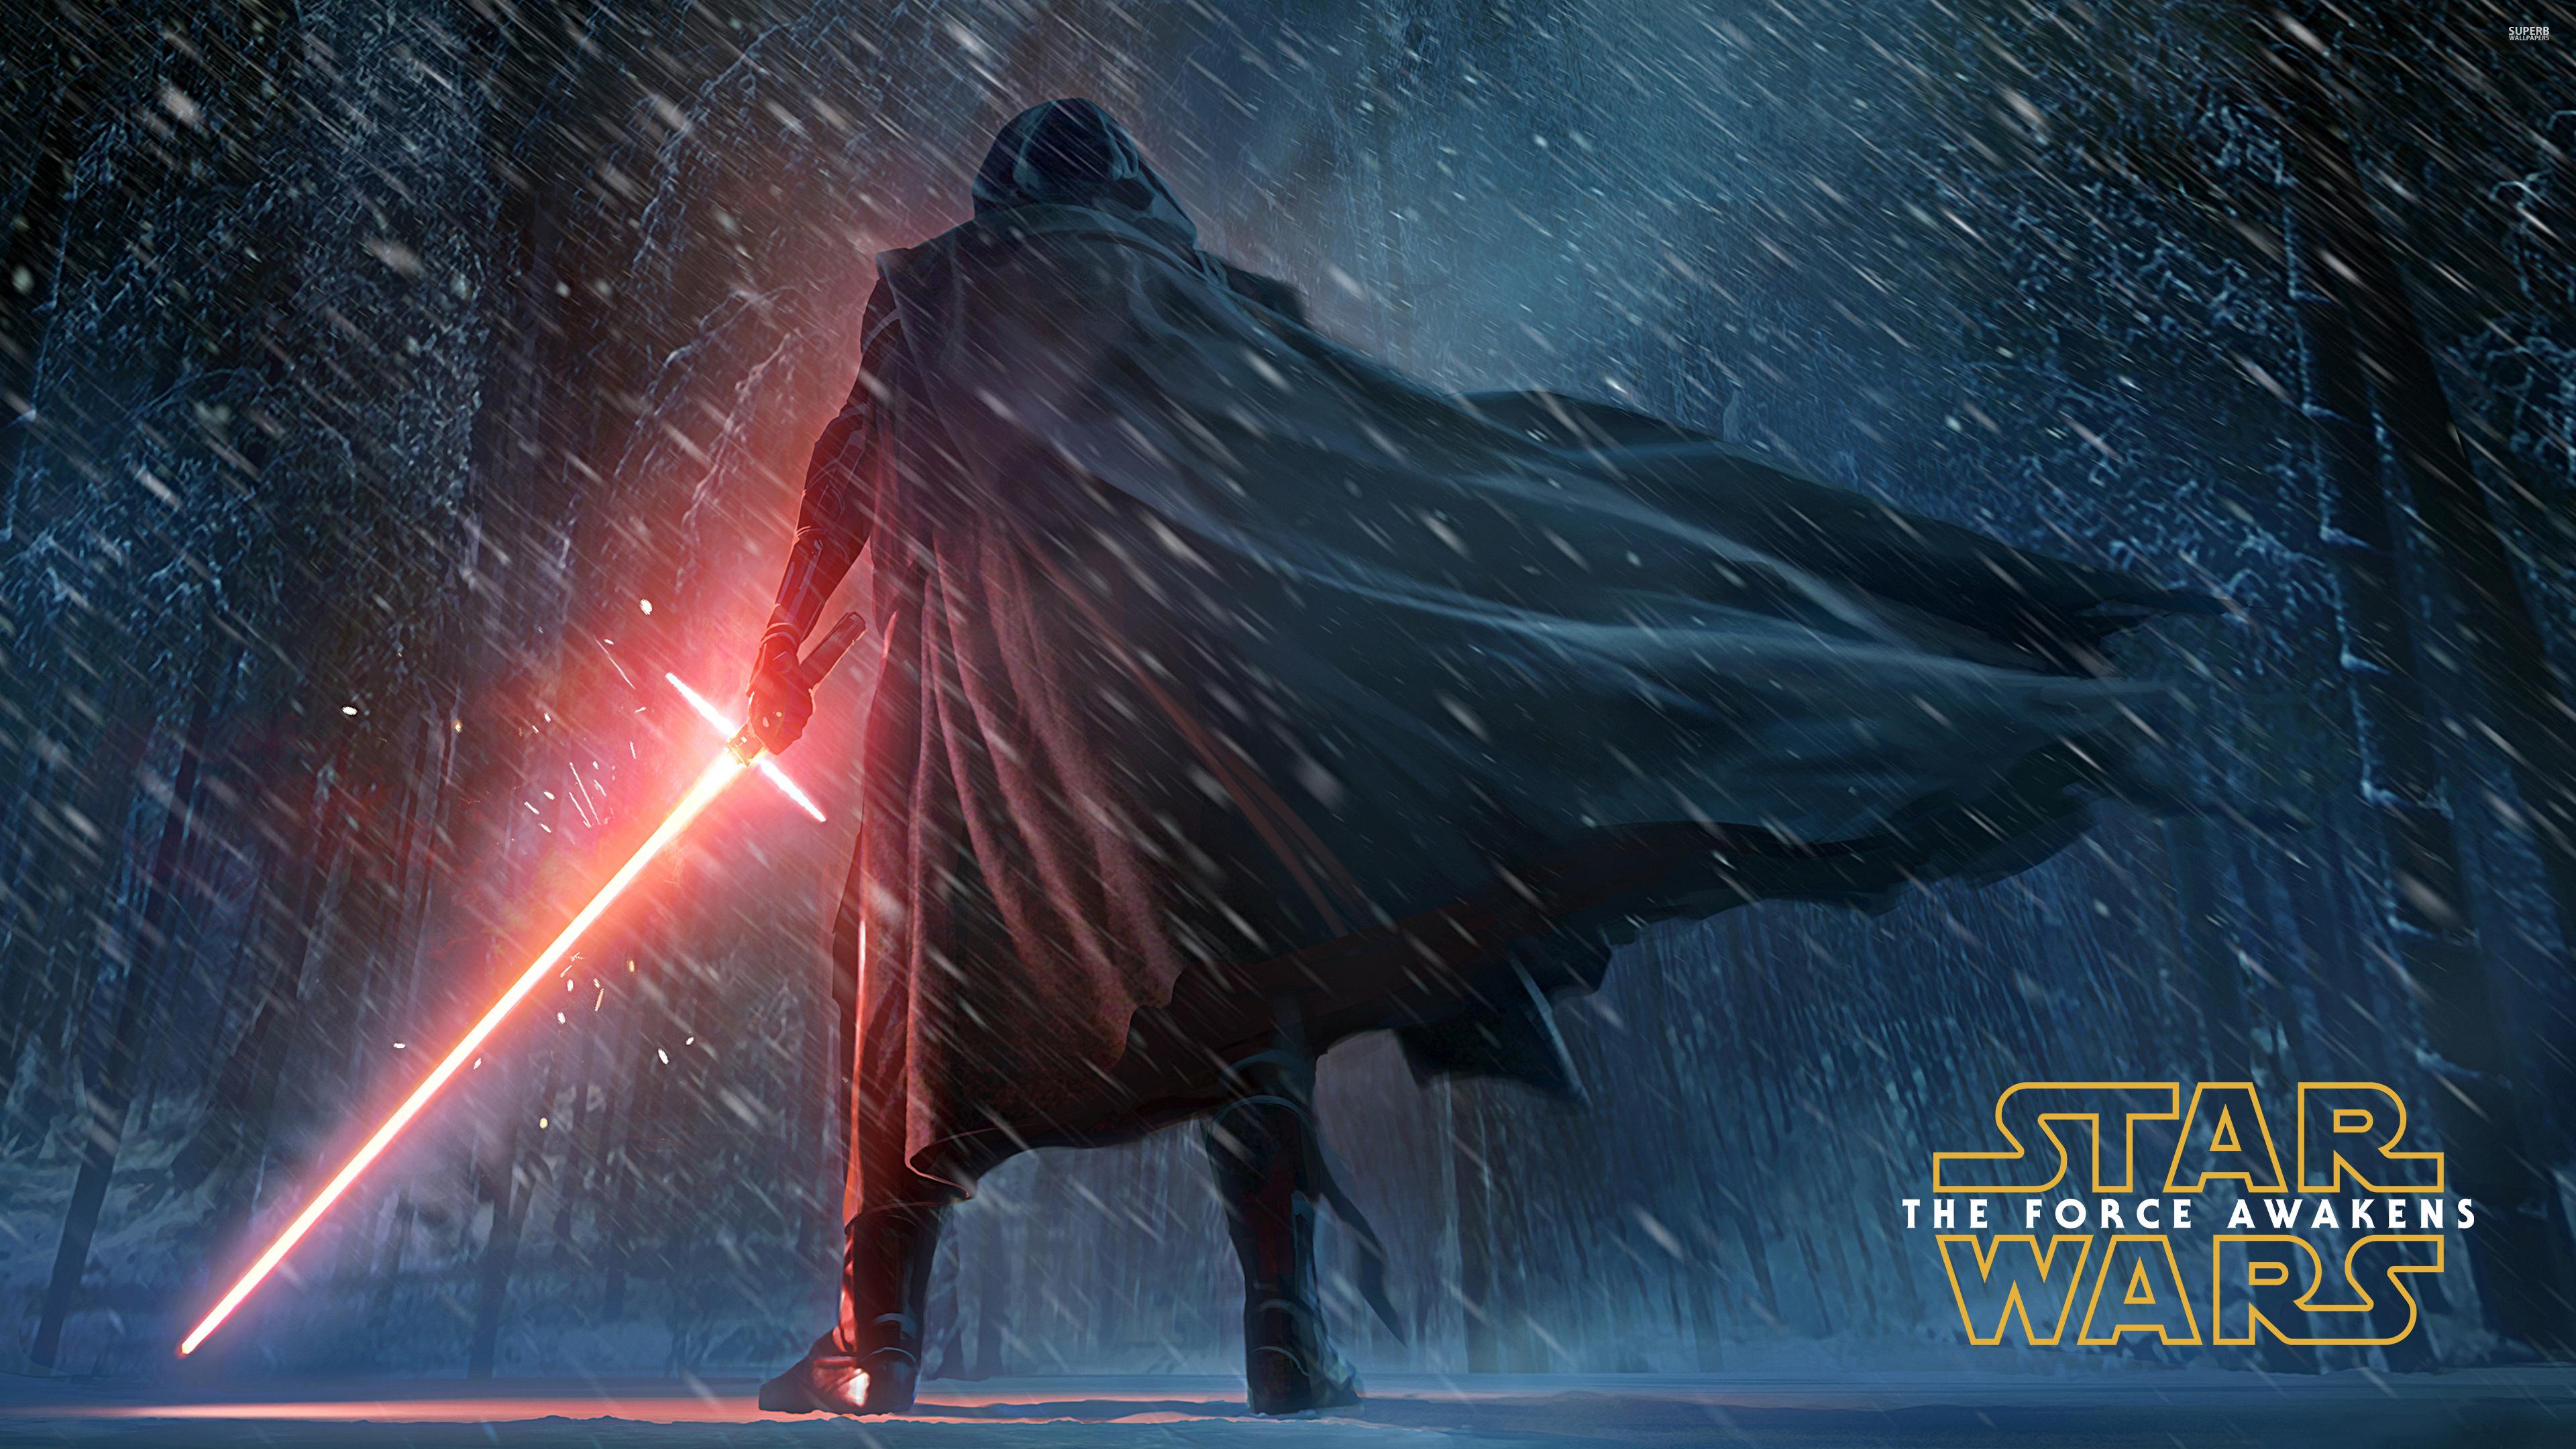 Kylo Ren Star Wars wallpaper HD background download desktop 3840x2160